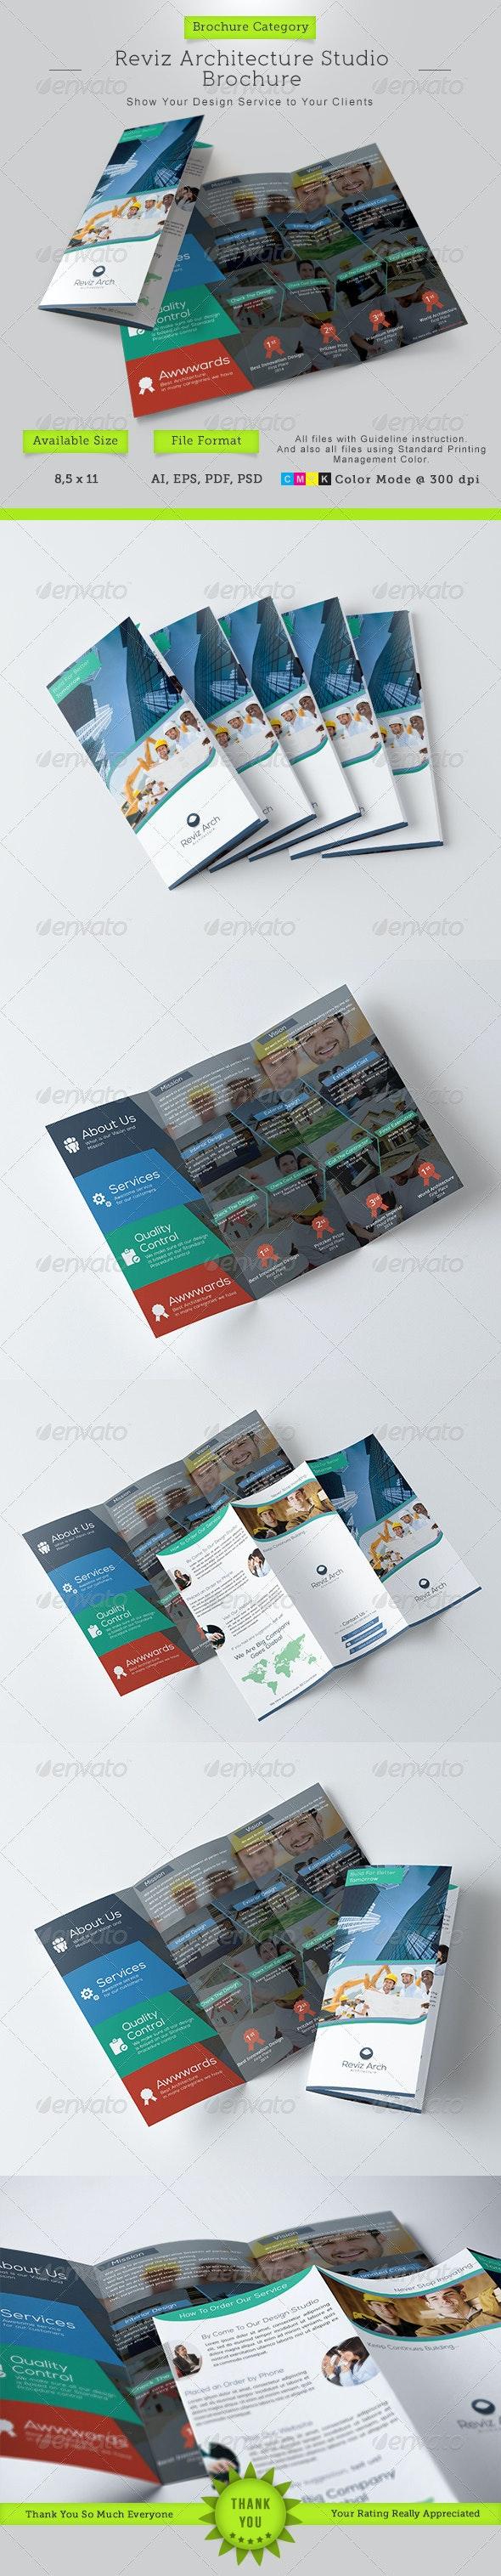 Reviz Architecture Studio Trifold Brochure - Corporate Brochures